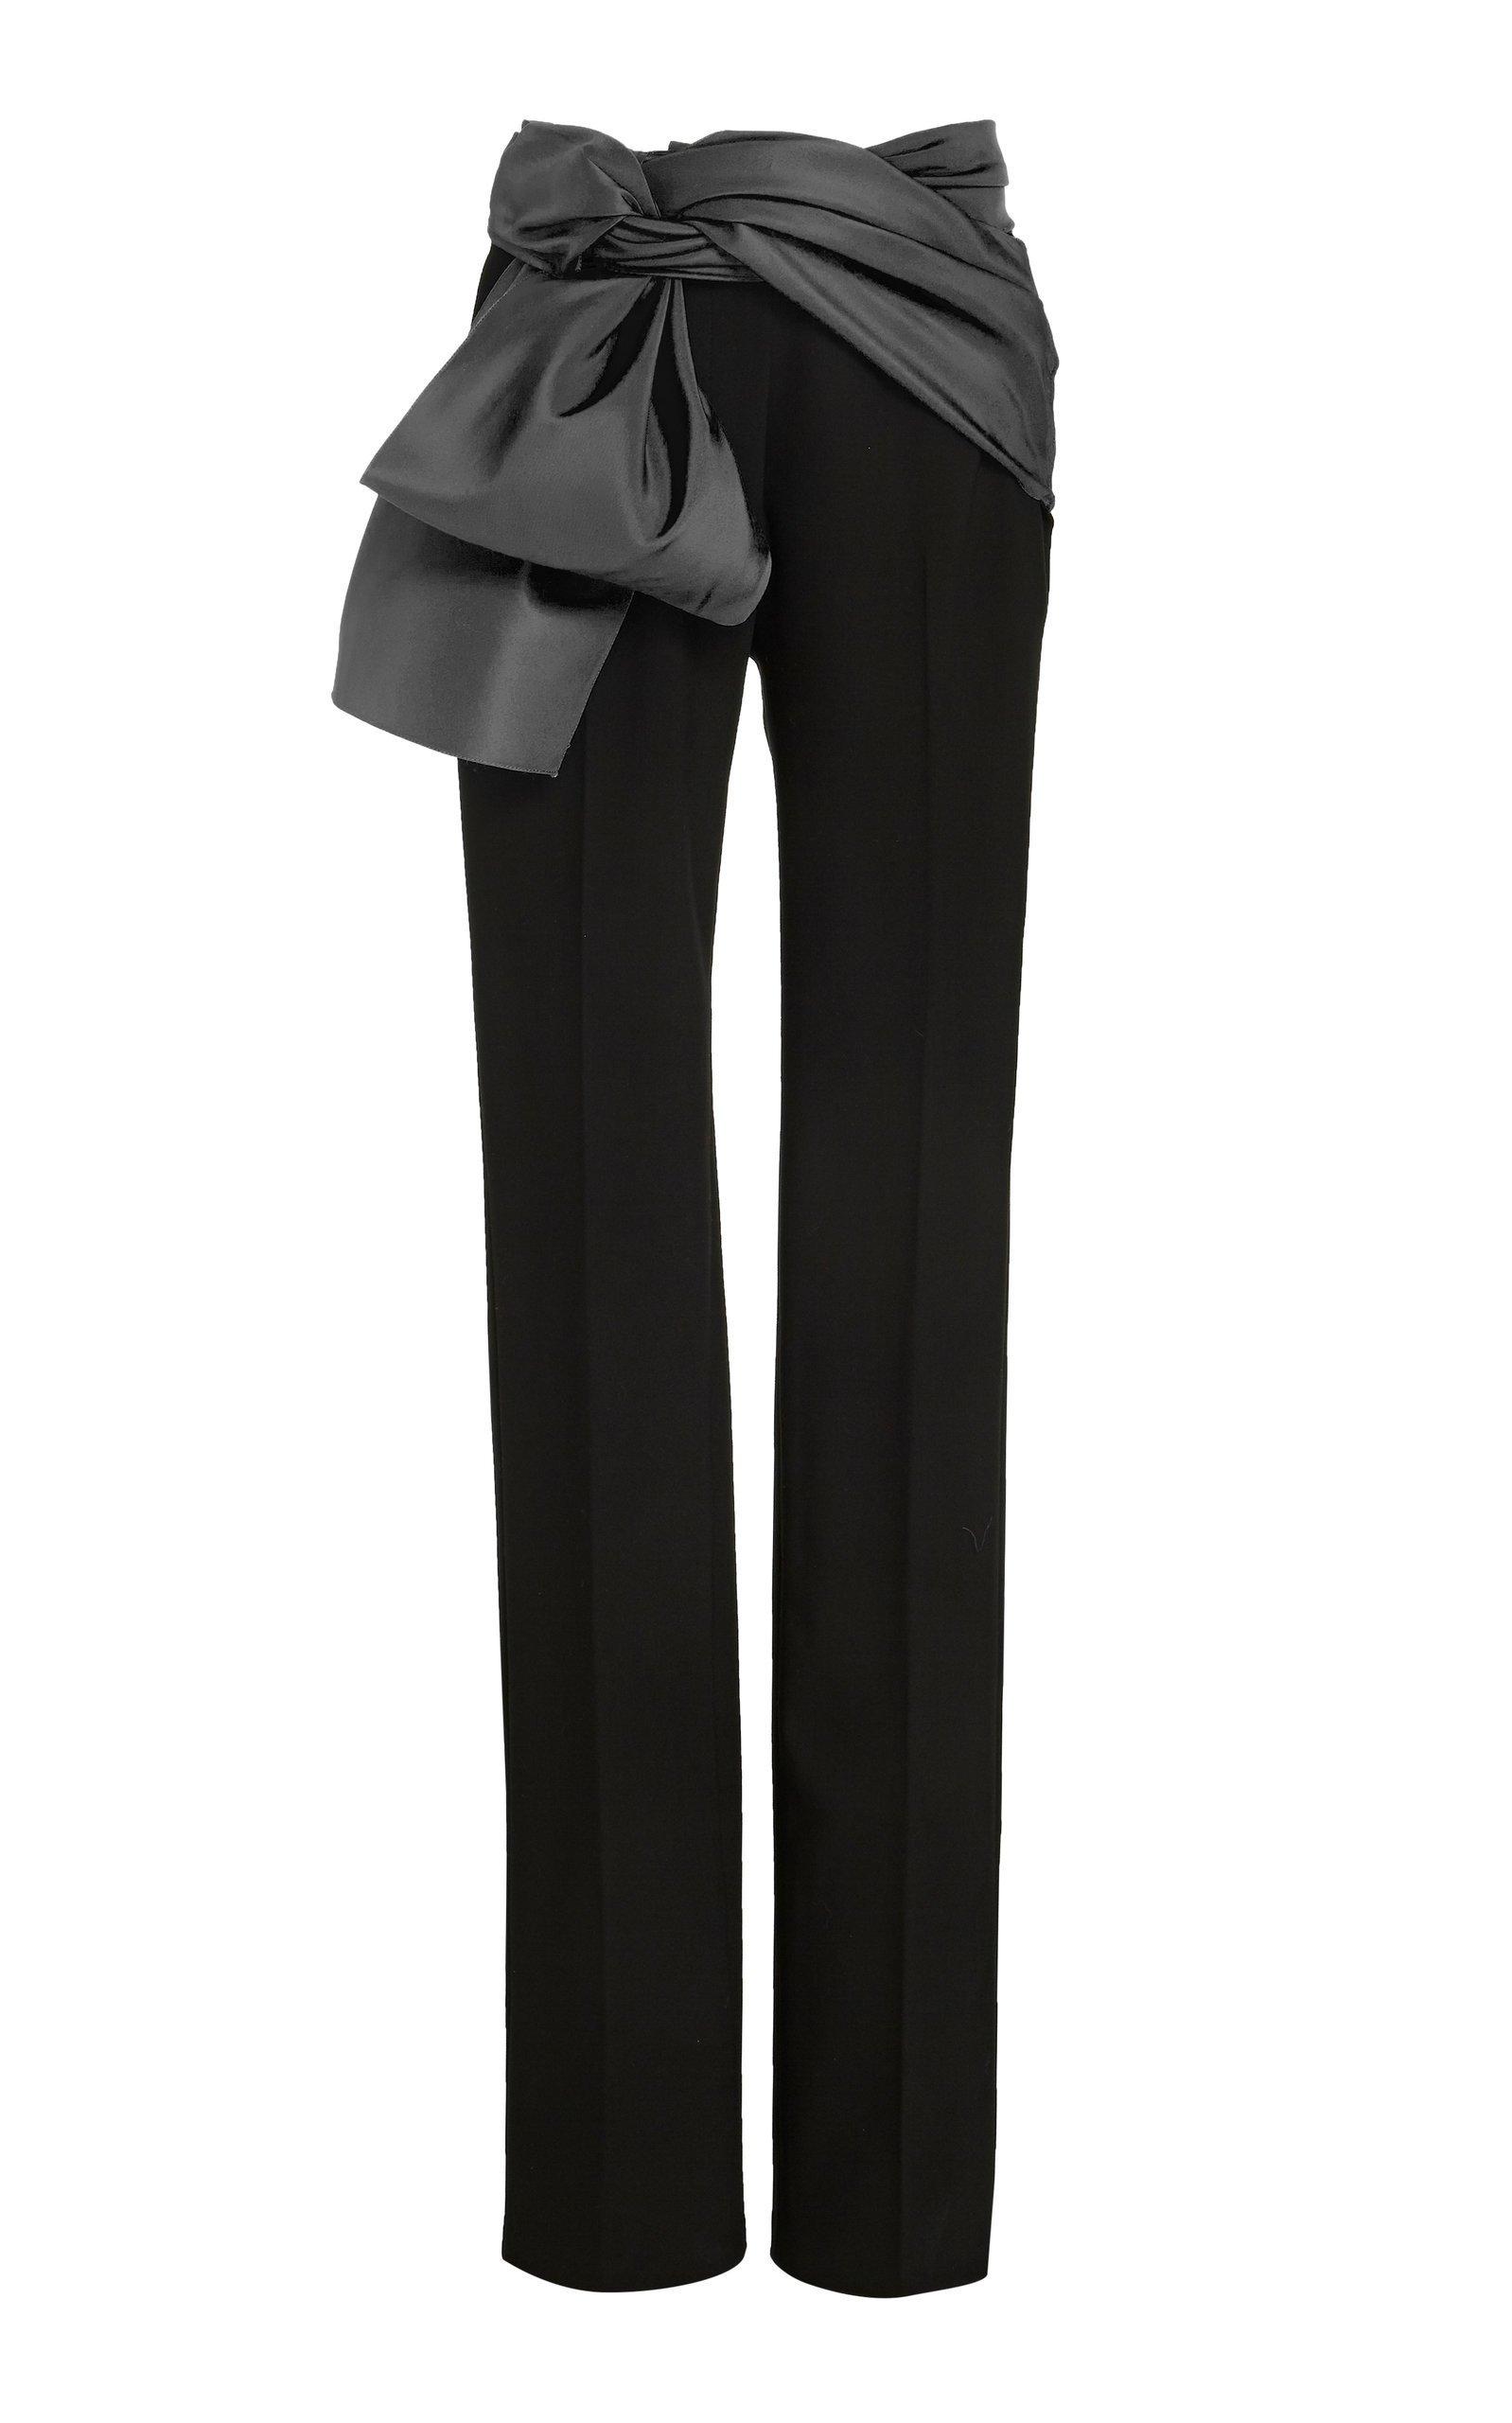 Carolina Herrera Satin-Trimmed Crepe Straight-Leg Pants Size: 8